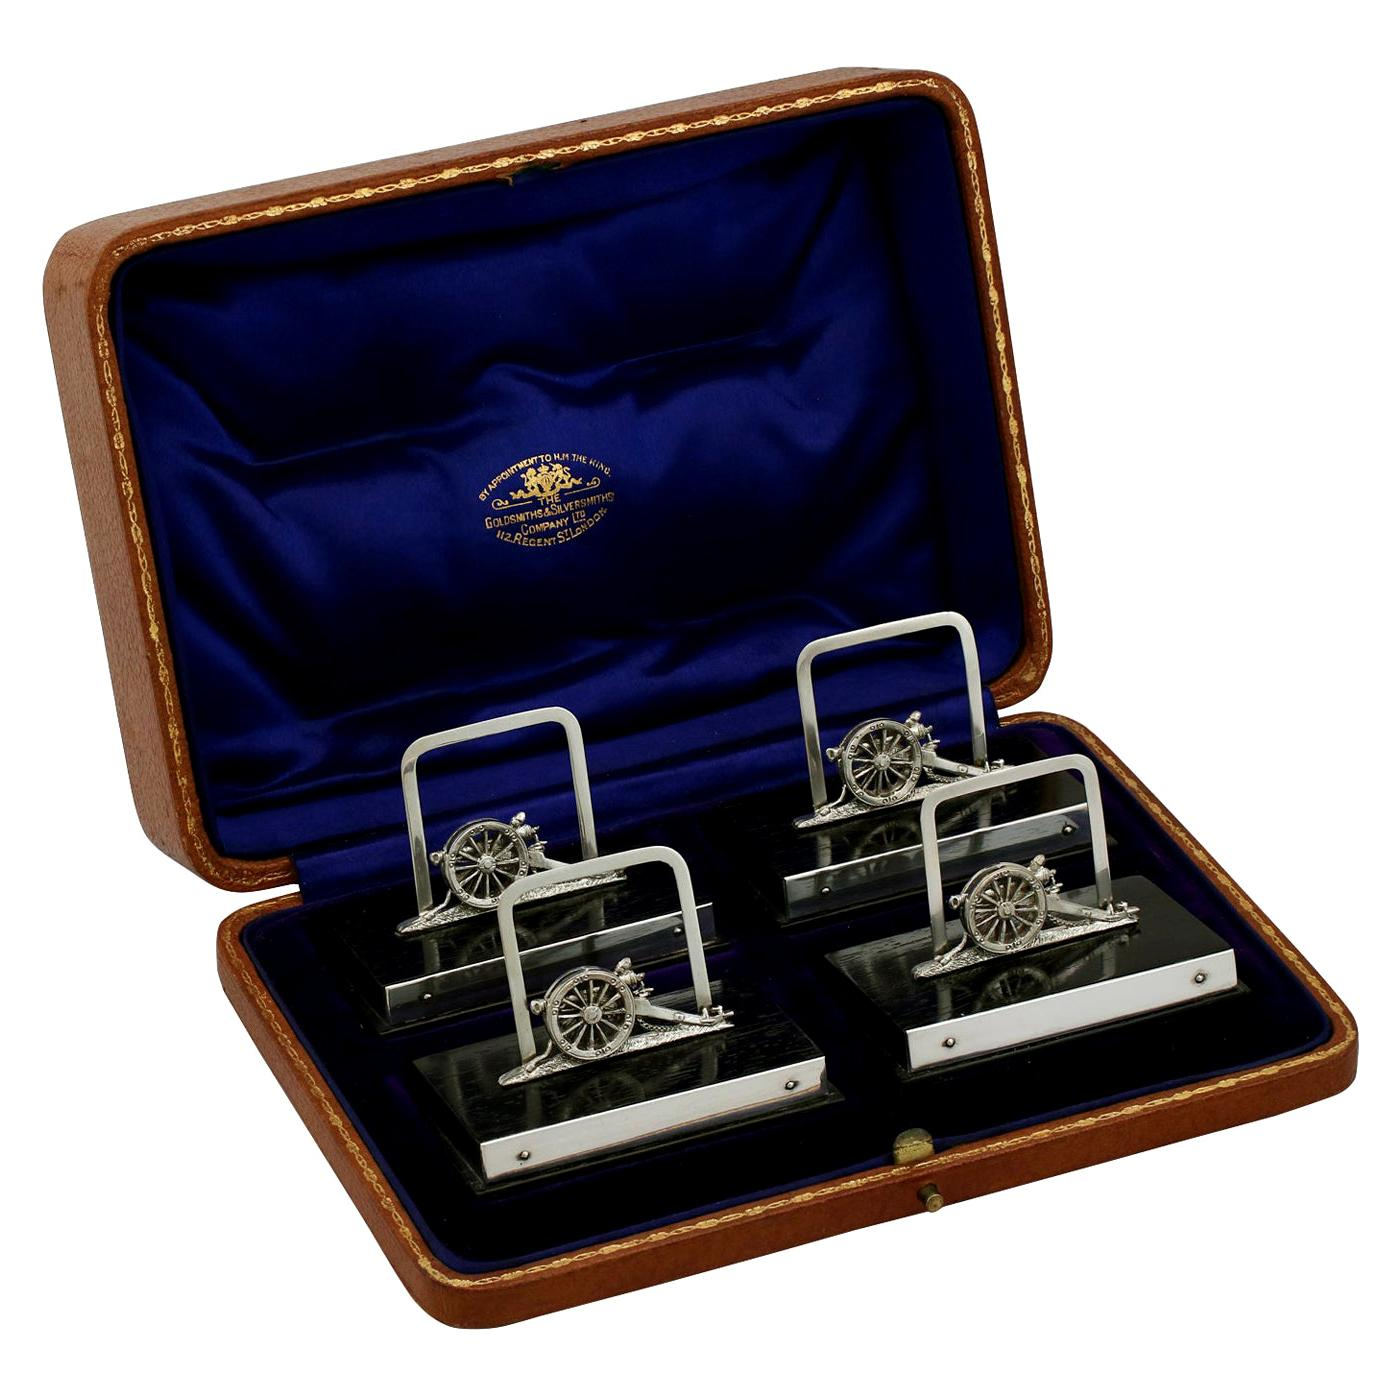 Antique George V 1912 English Sterling Silver Menu Holders